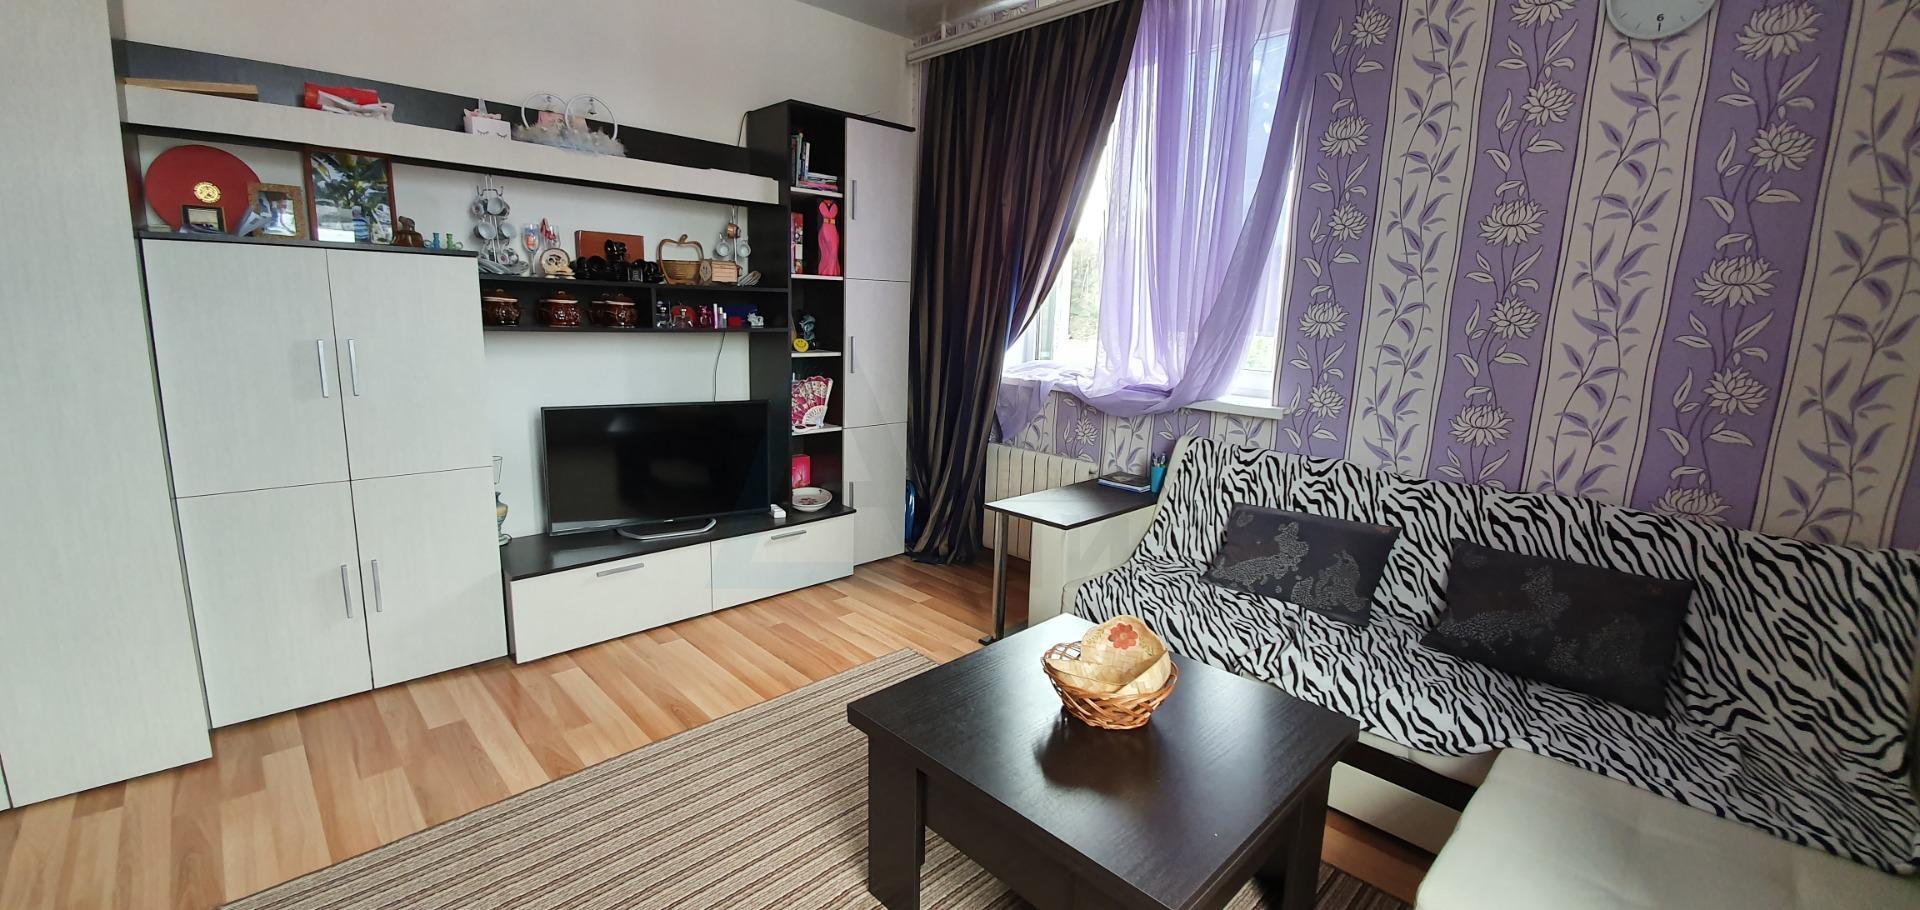 Квартира на продажу по адресу Россия, Краснодарский край, Туапсинский Район, Туапсе, улица Пушкина, 41